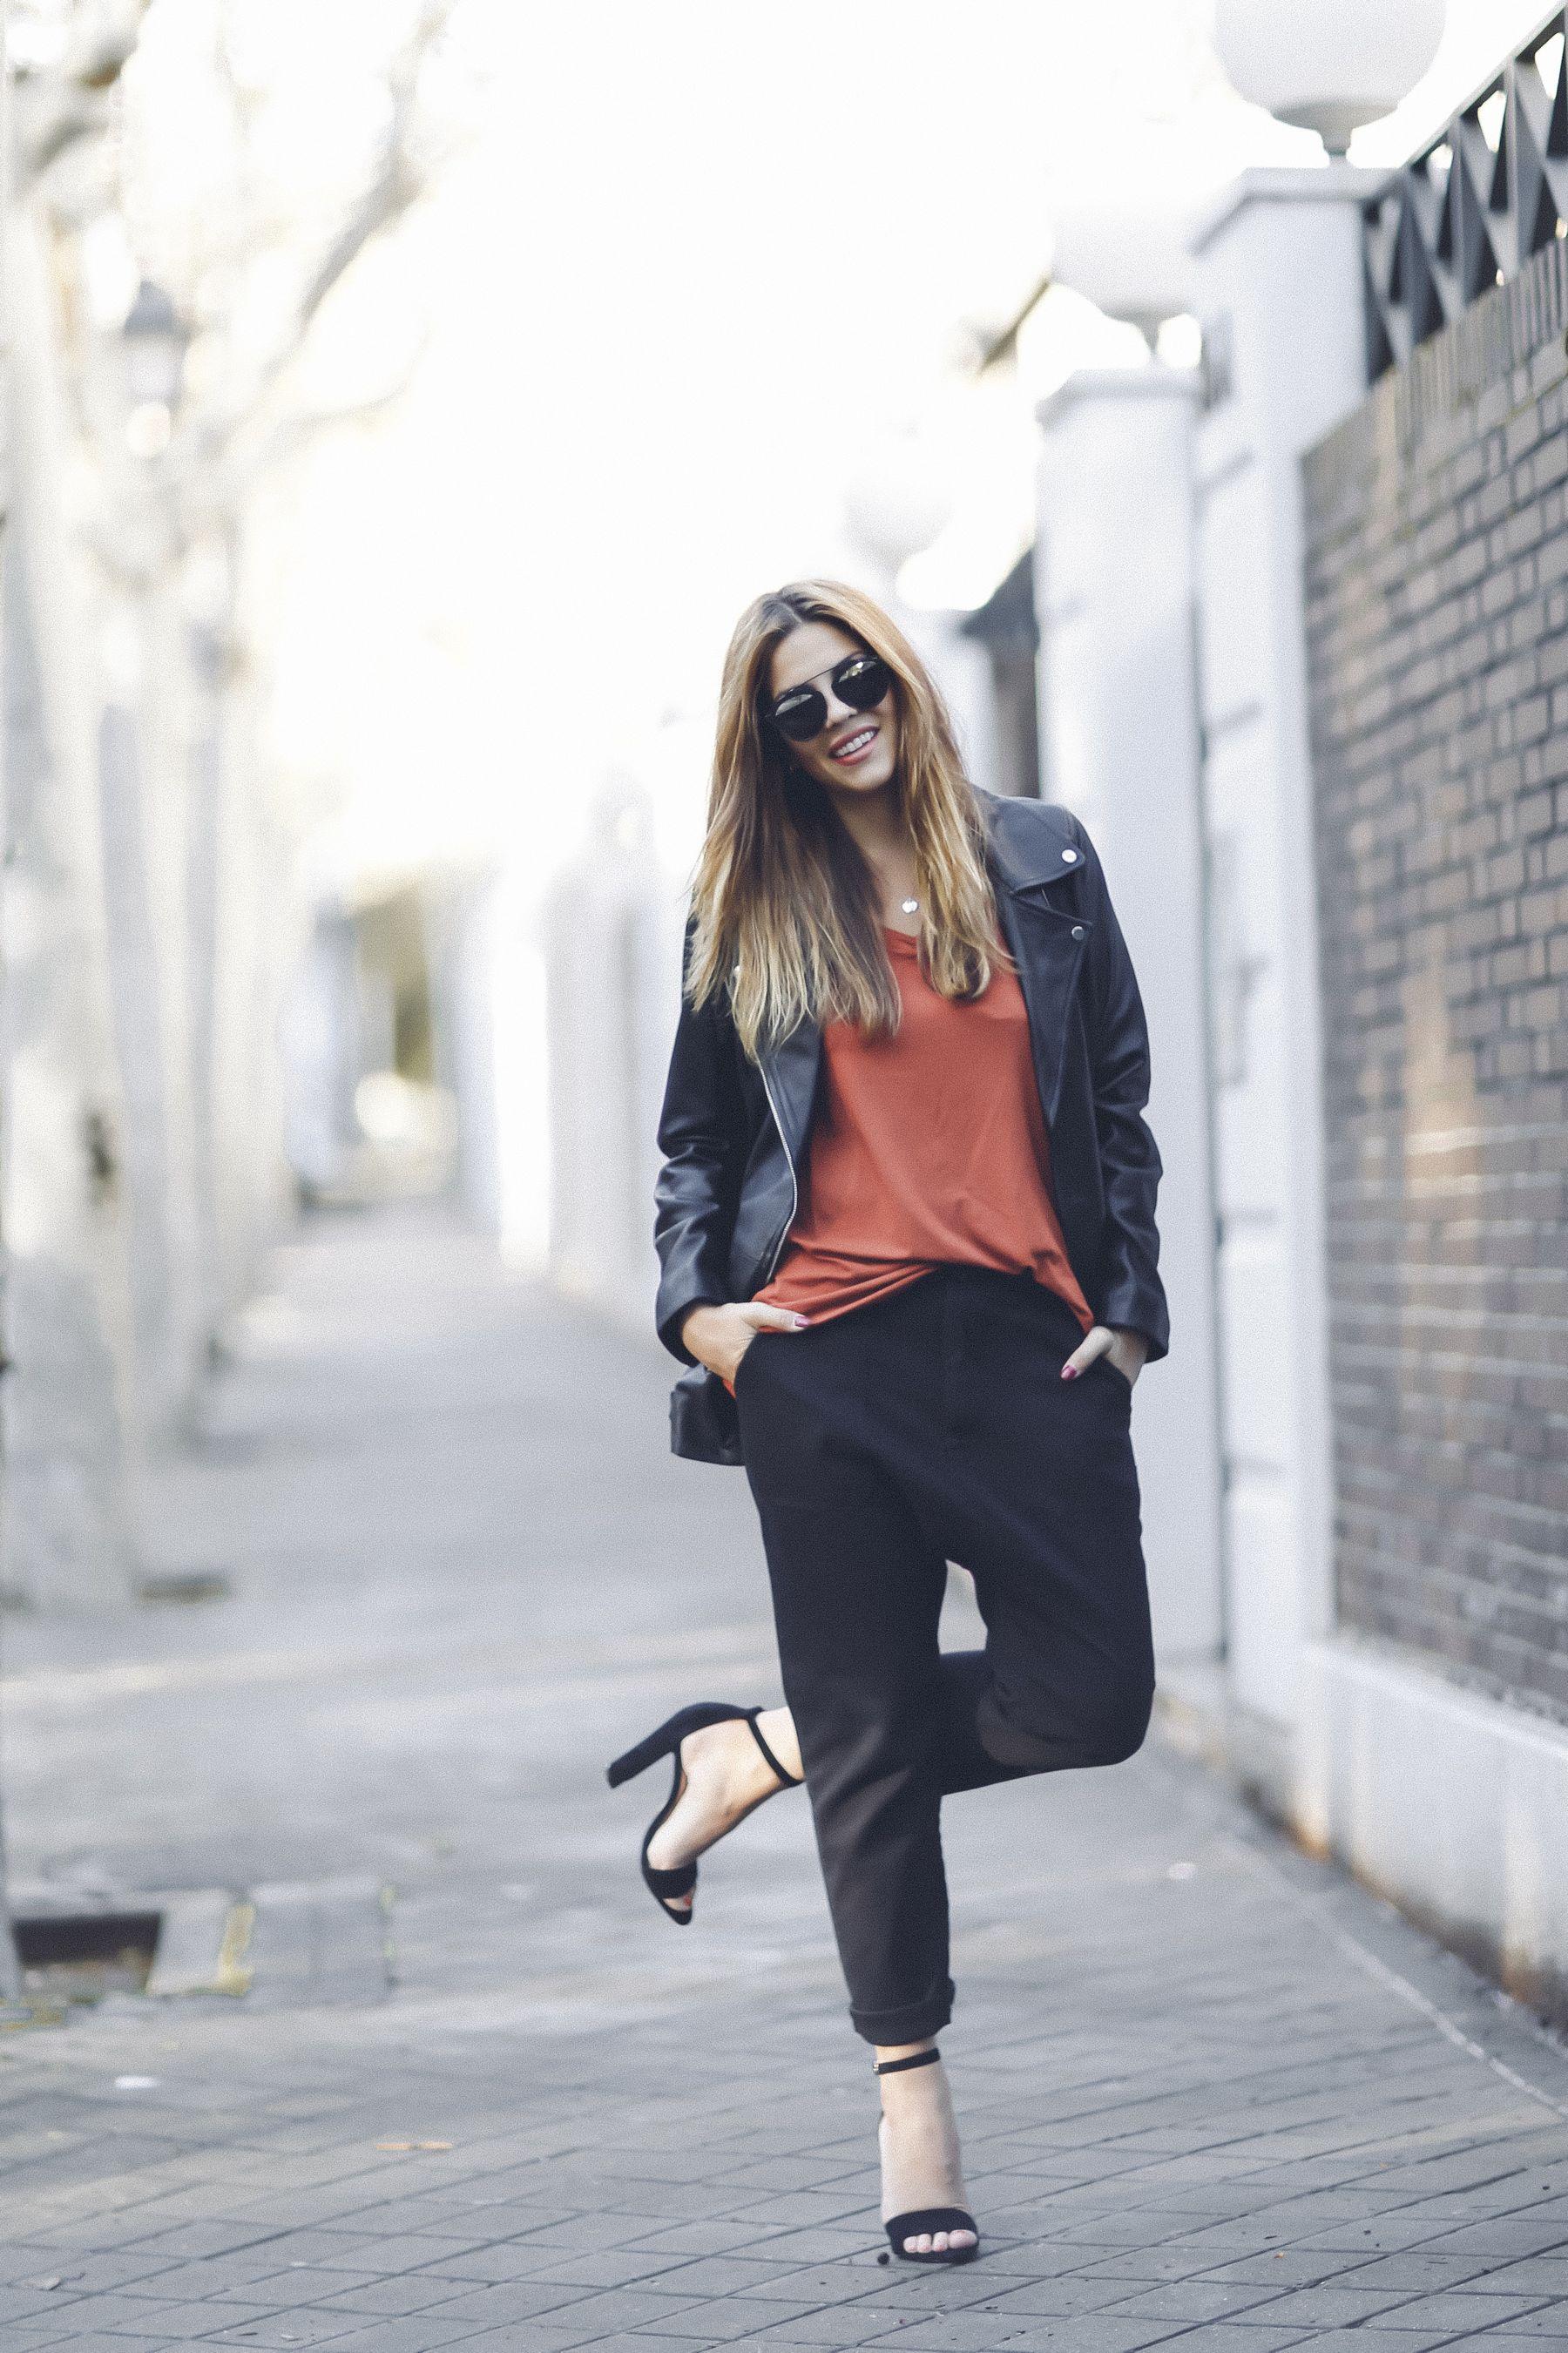 sandalias sandals mbym outfit look primavera spring camiseta zara steve madden Dior gafas de sol sunglasses street style trendy taste_1